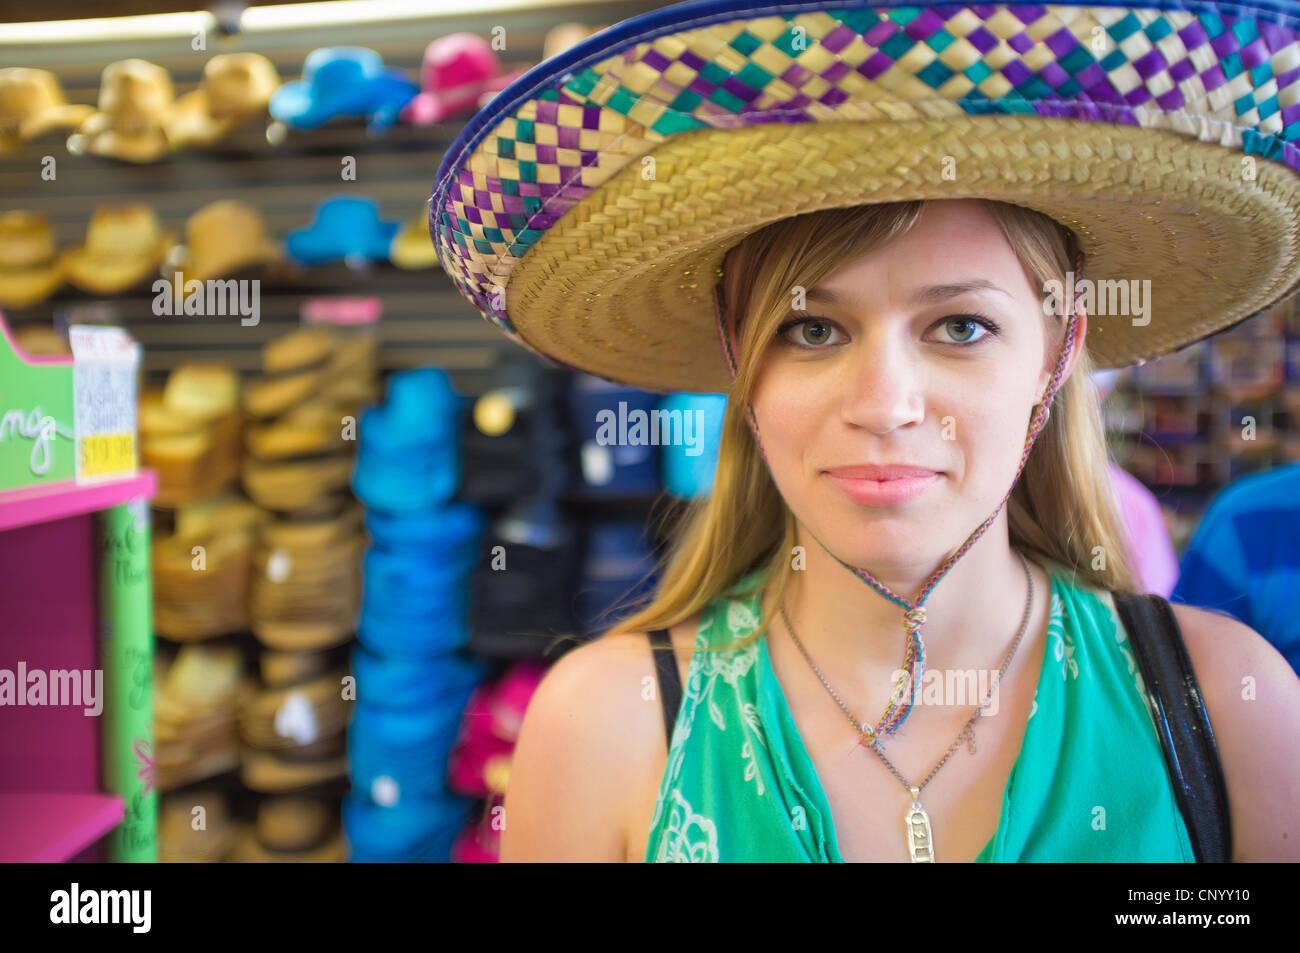 Sombrero frau frau alte junge Meine Frau